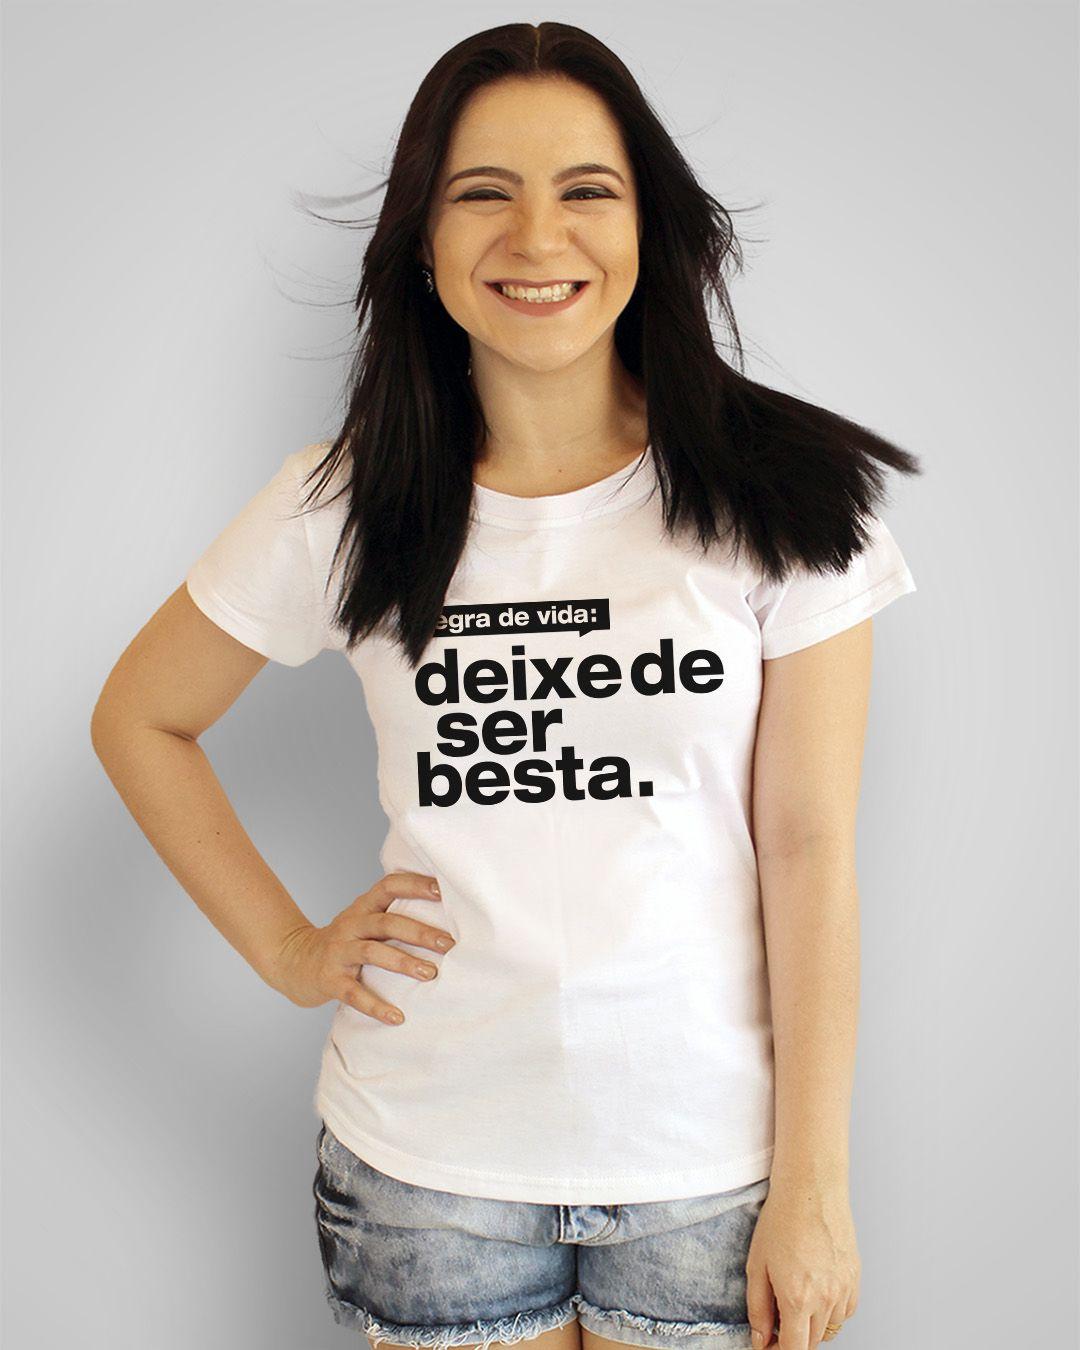 Camiseta Regra de vida: deixe de ser besta